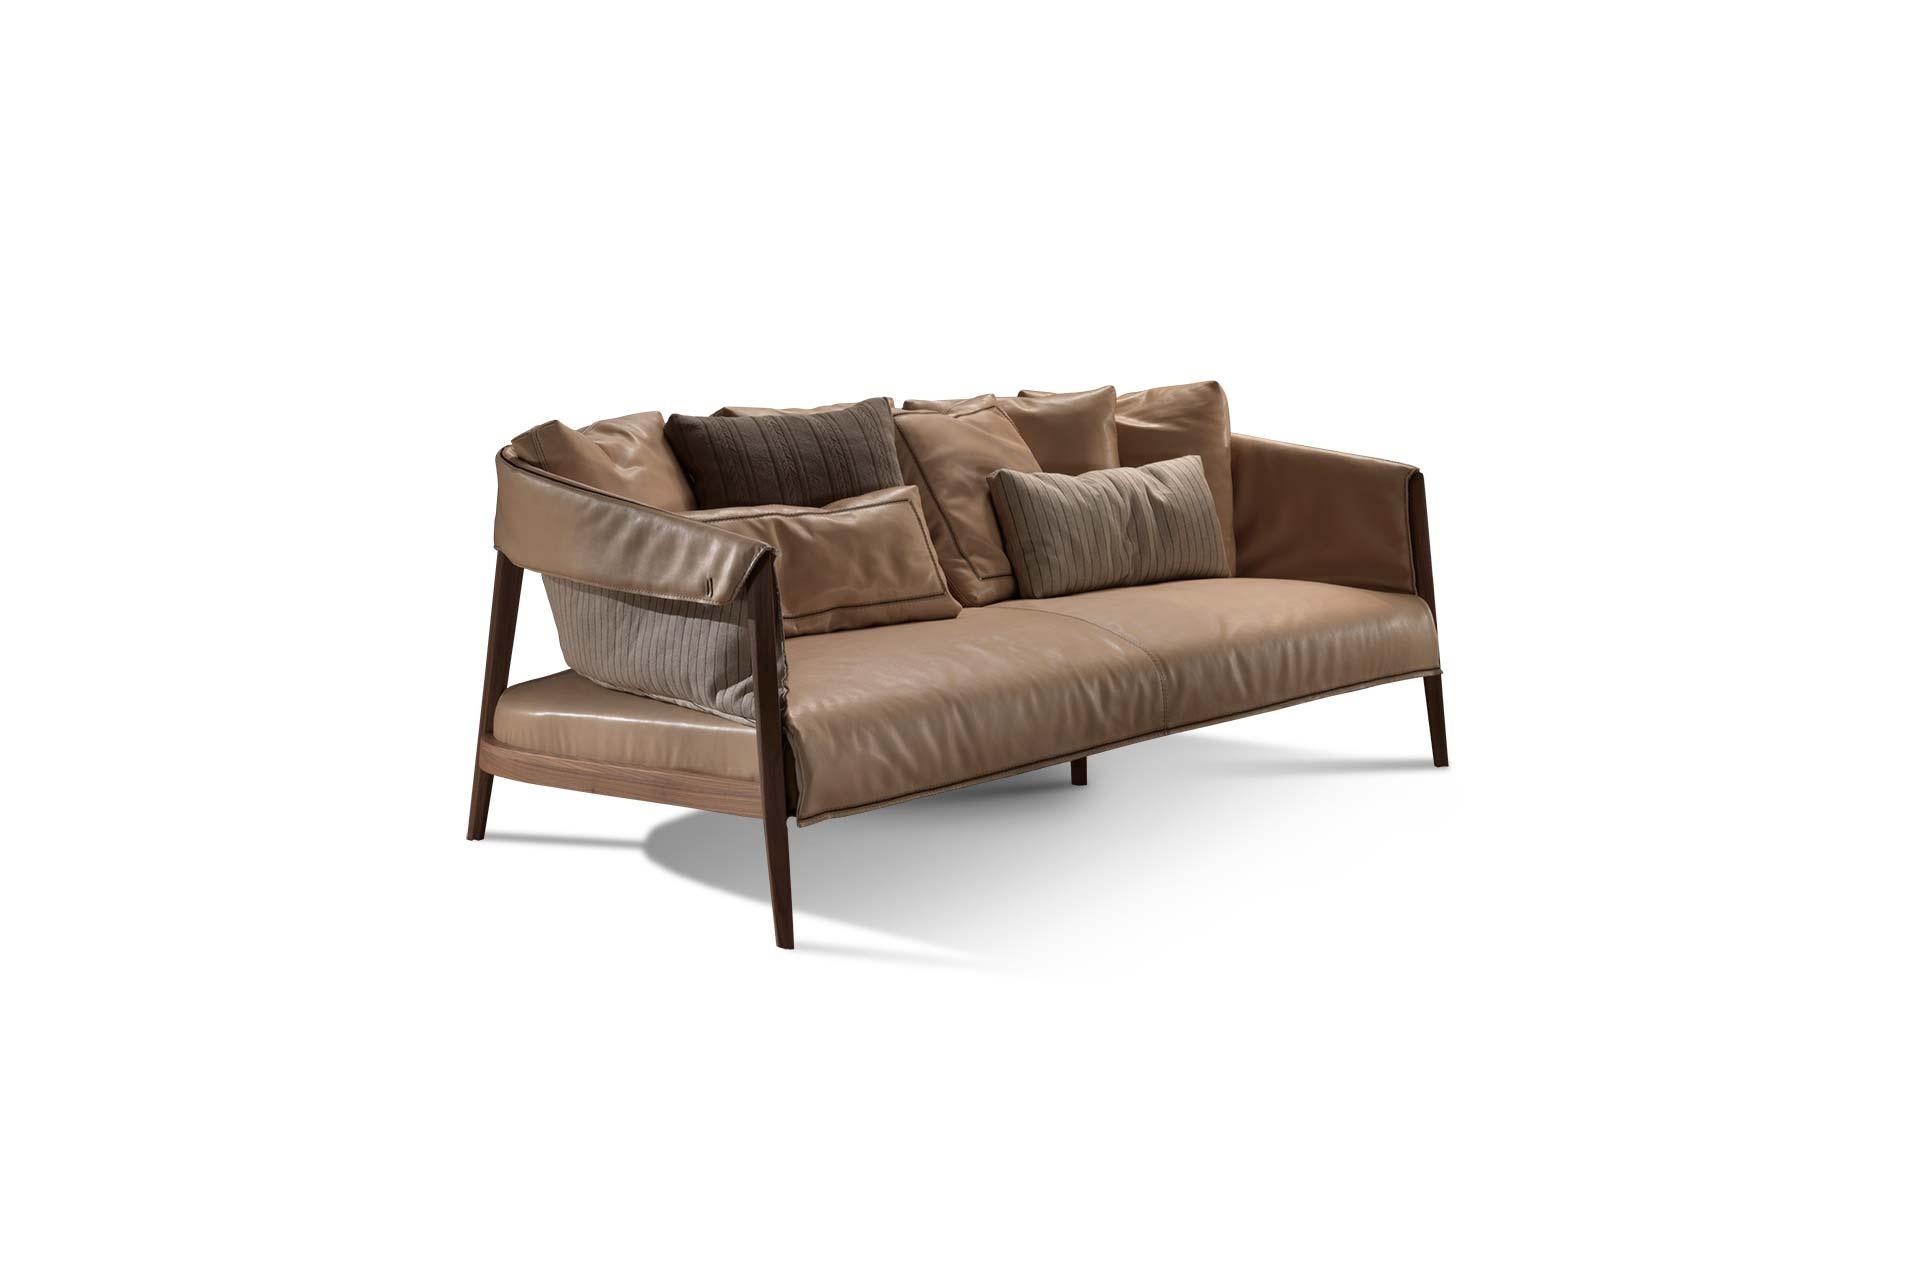 BURTON Sofa by Frigerio